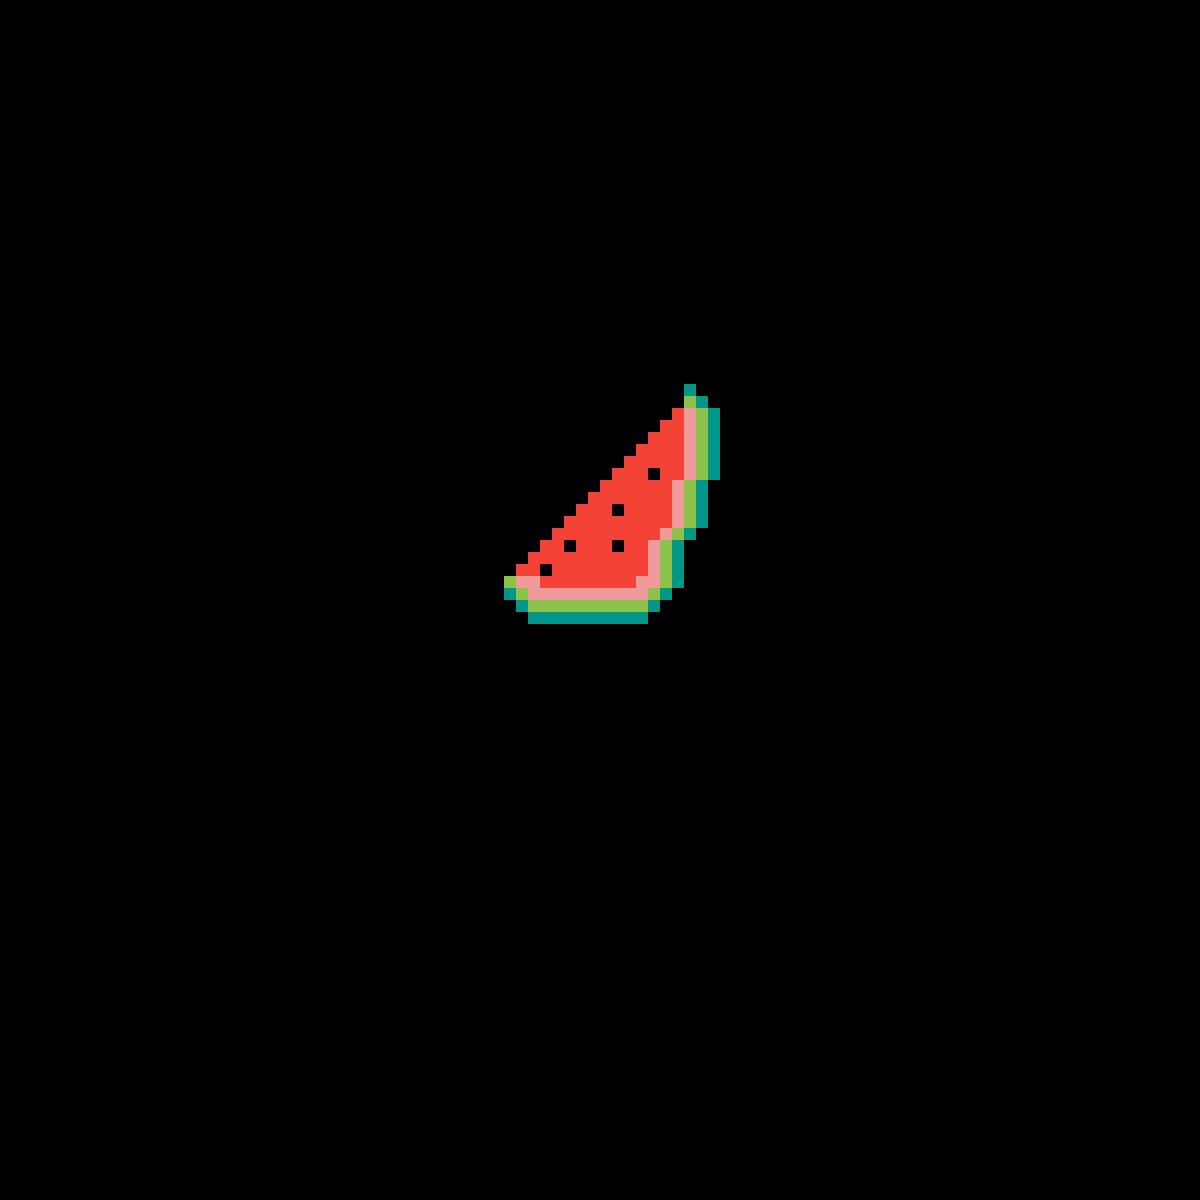 Minecraft Watermelon from memory by ILoveIcecream17